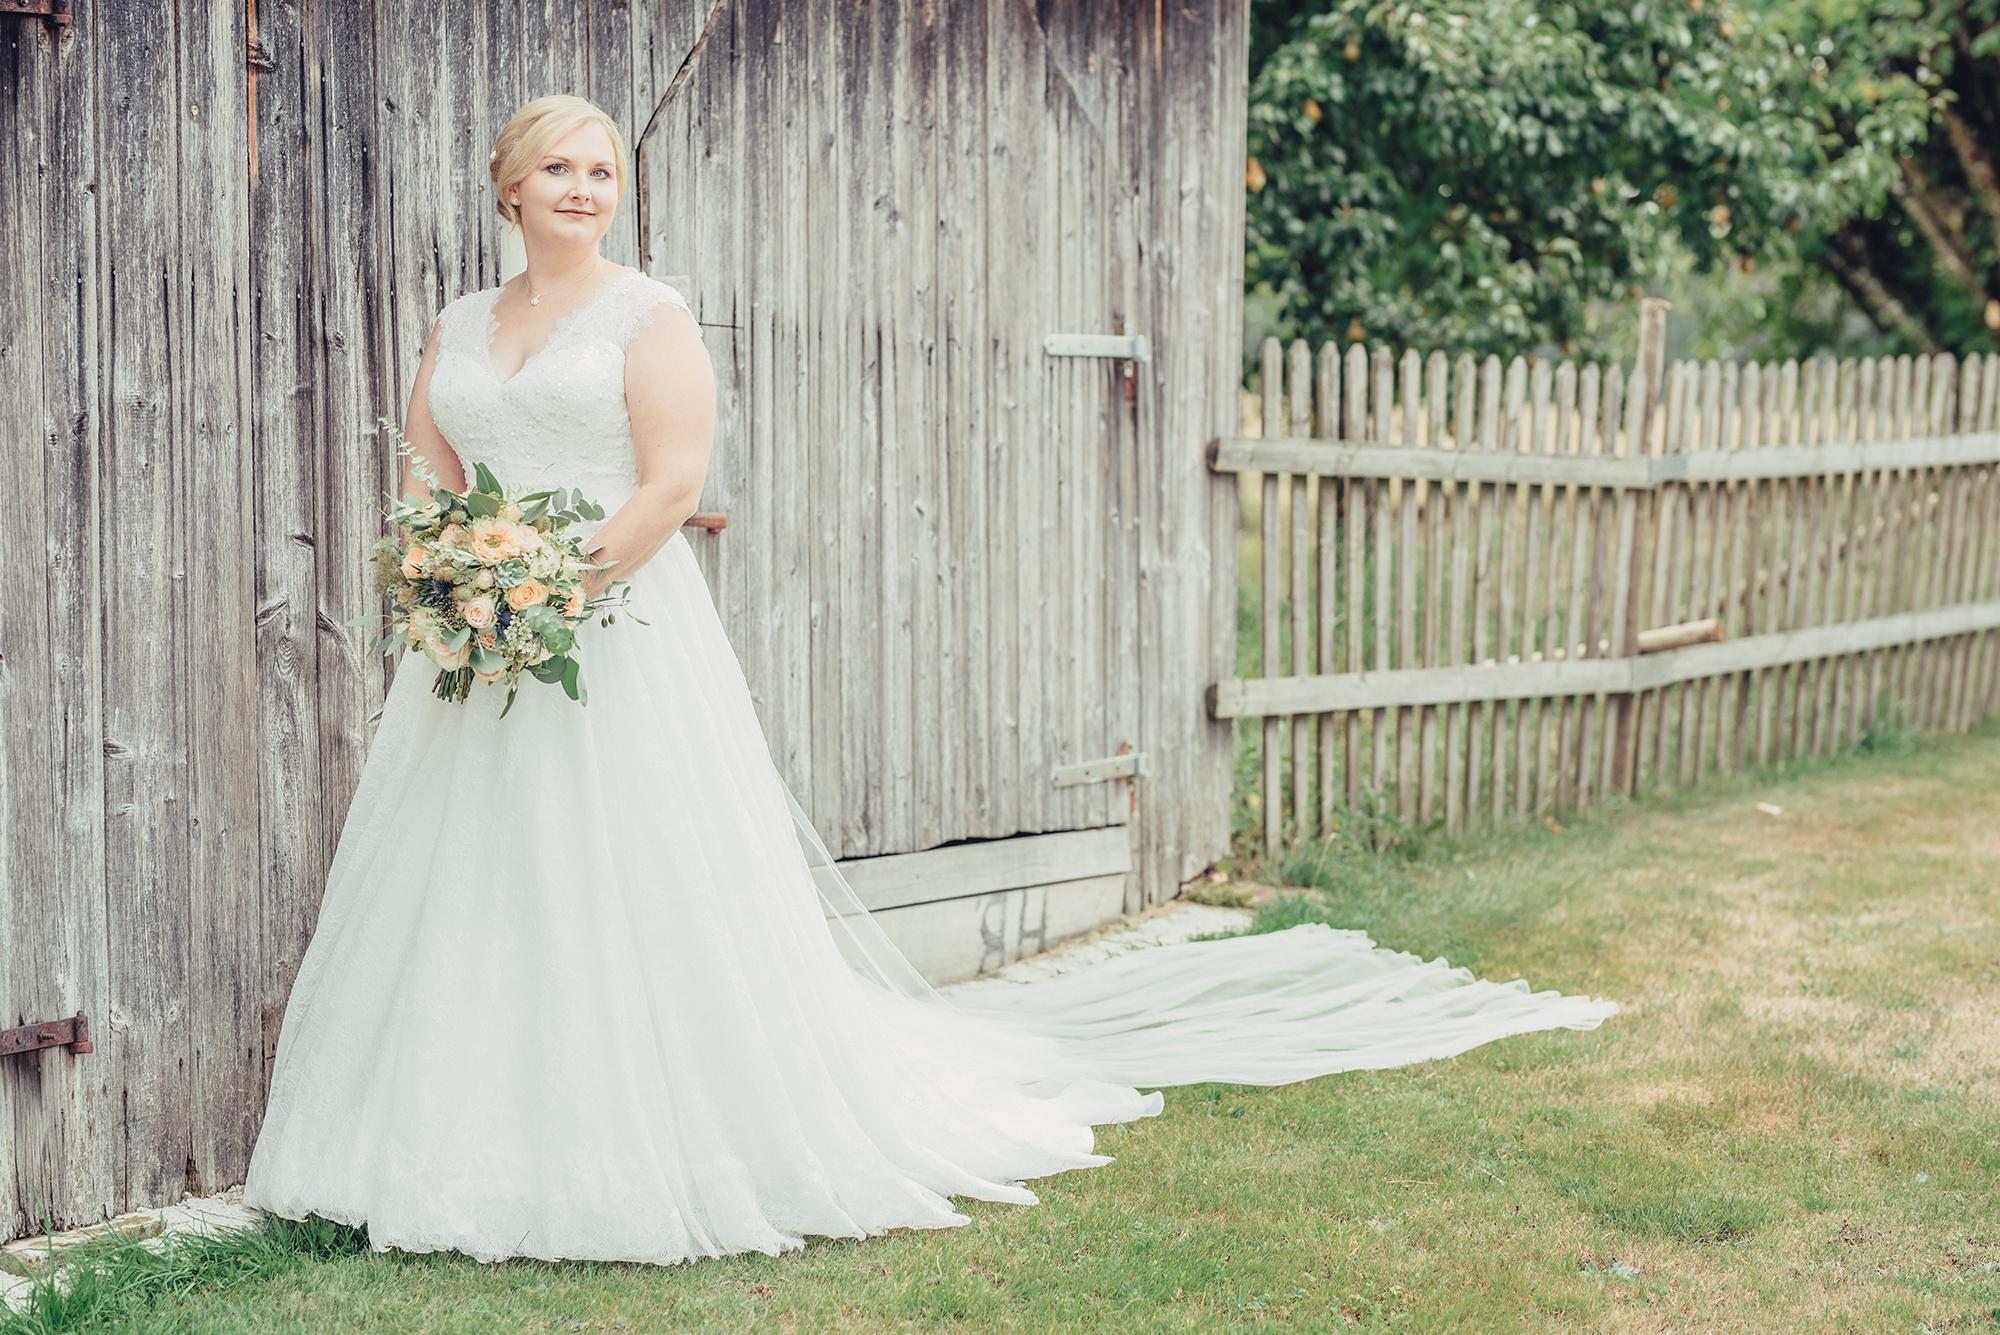 weddingseptemberluminoxx92348234139